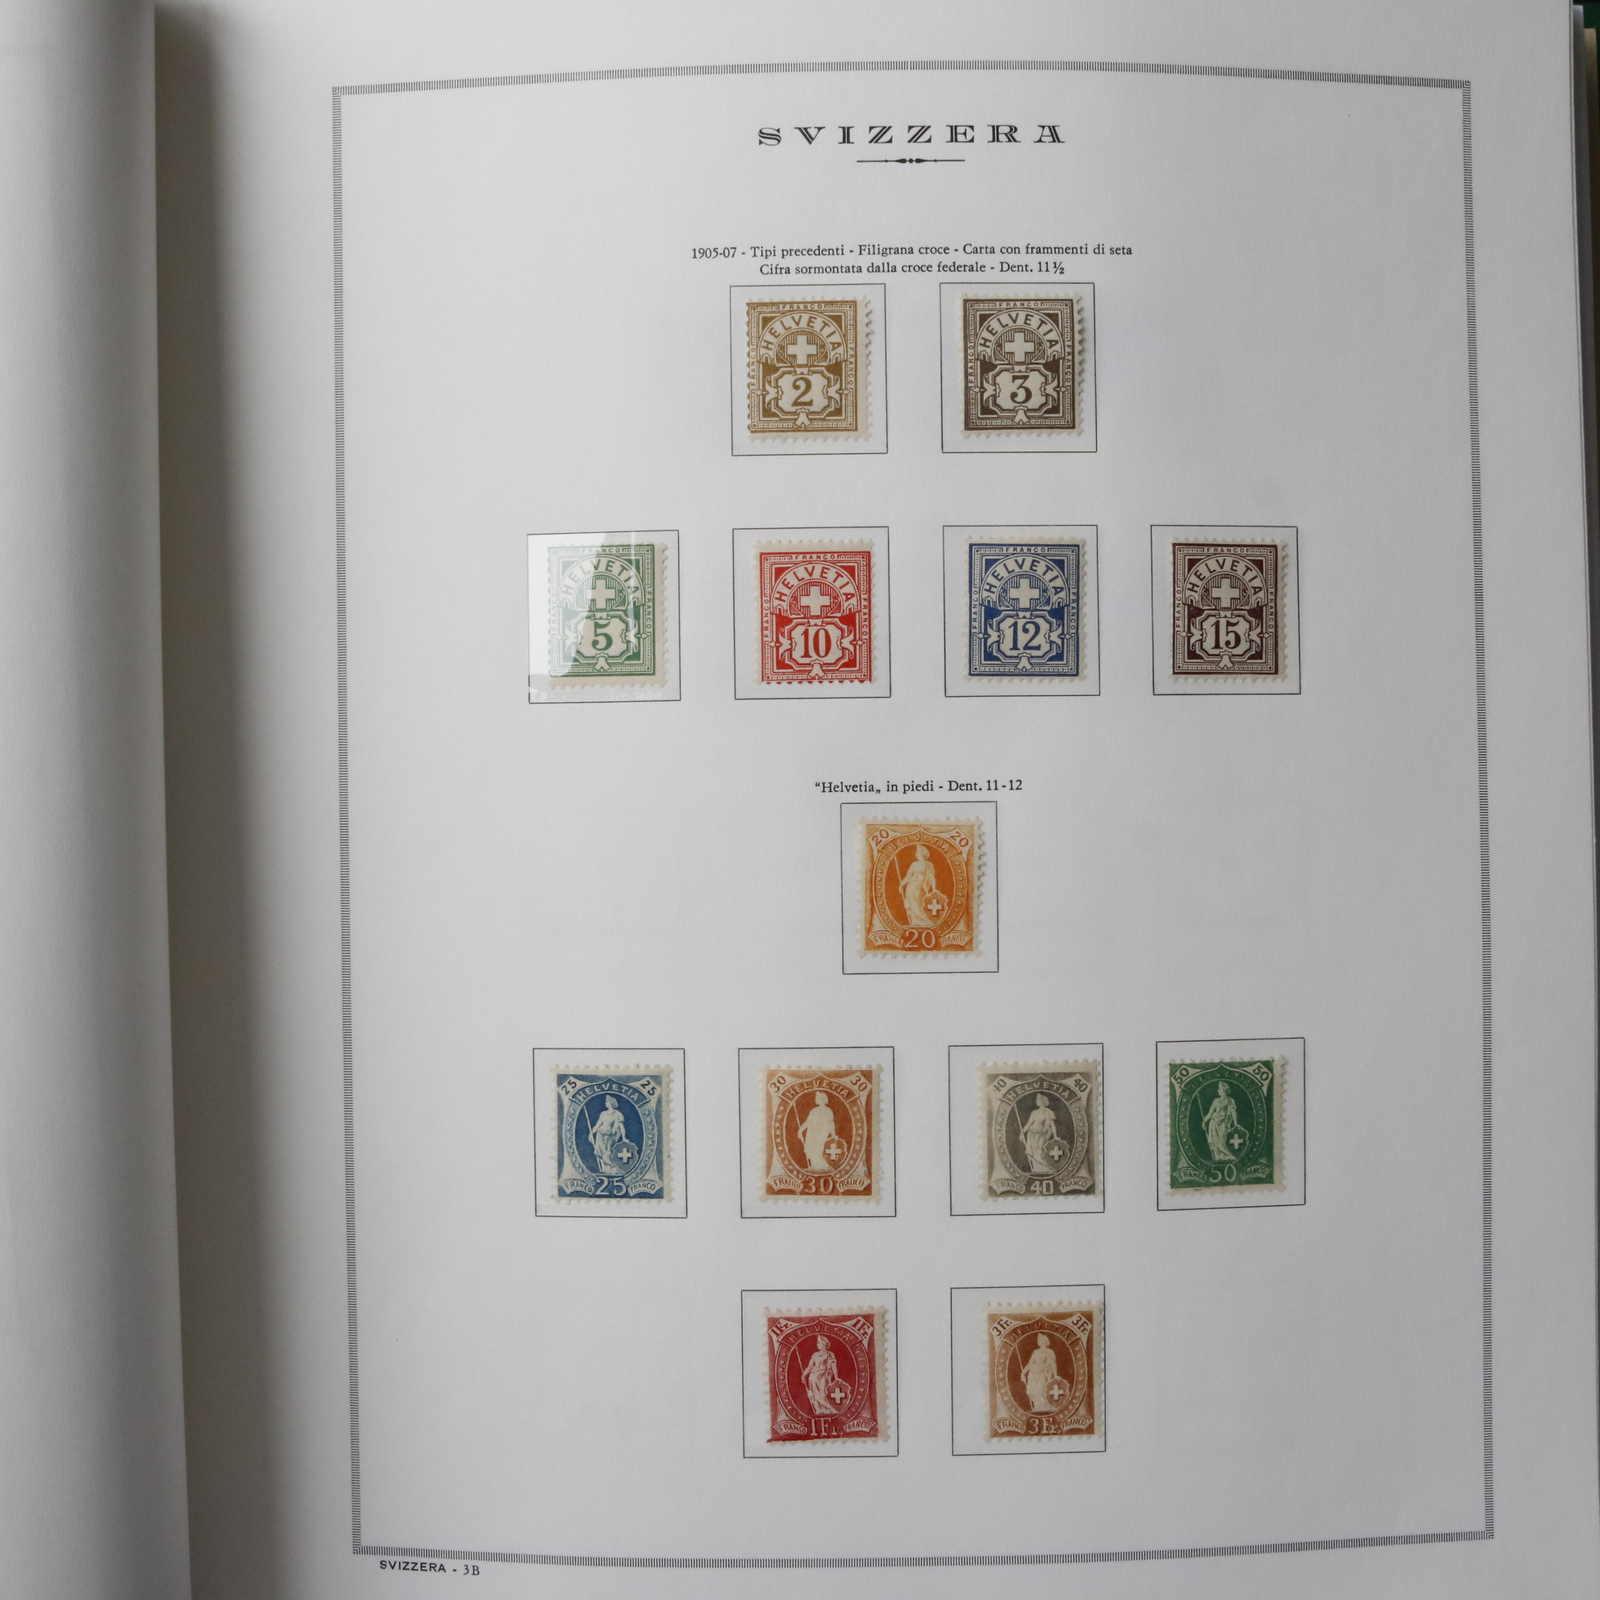 Lot 2563 - COLLECTIONS & ACCUMULATIONS Switzerland -  Auktionshaus Schlegel 26 Public Auction